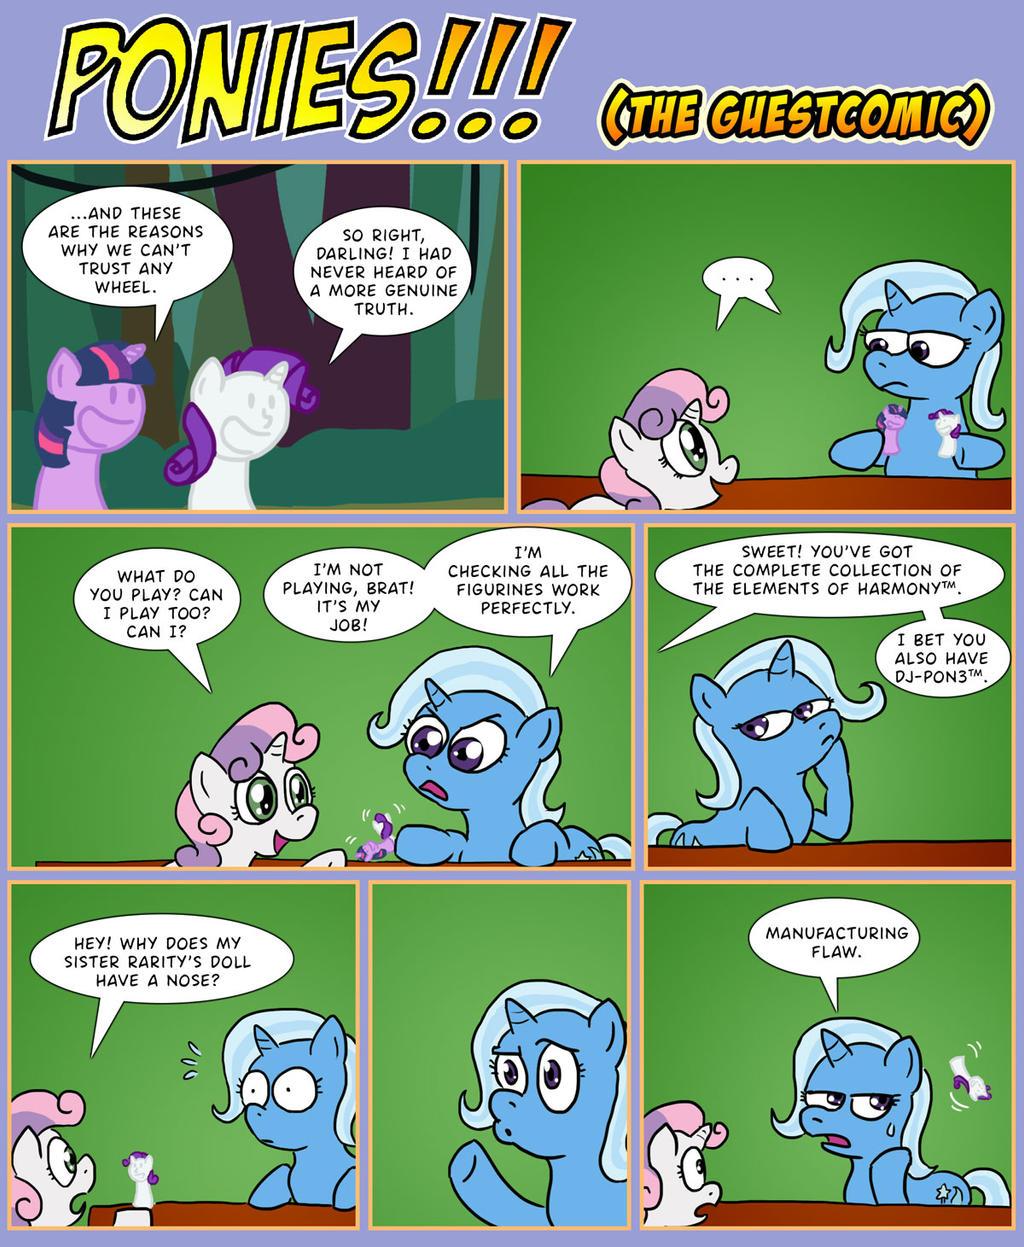 PONIES!!! - The guestcomic by Turag